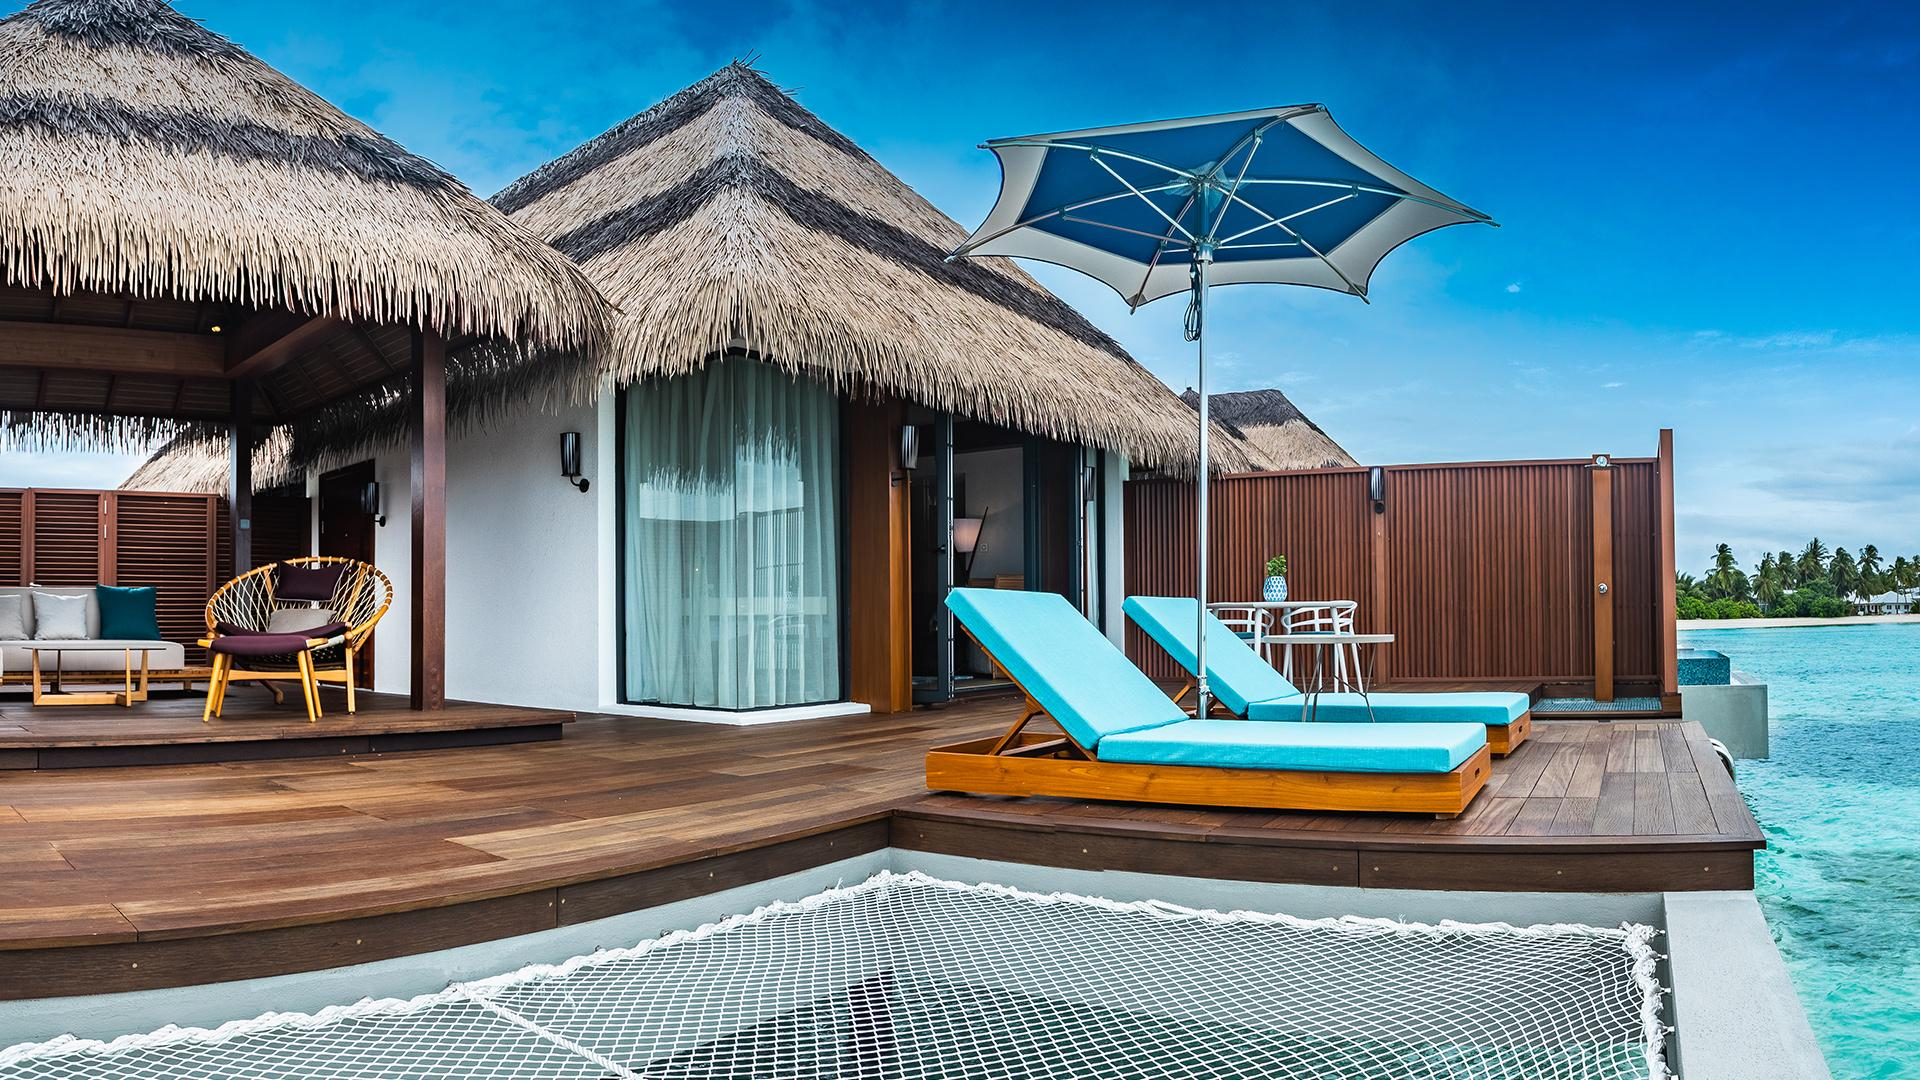 Ocean Villa image 1 at Pullman Maldives Maamutaa Resort by null, Upper South Province, Maldives